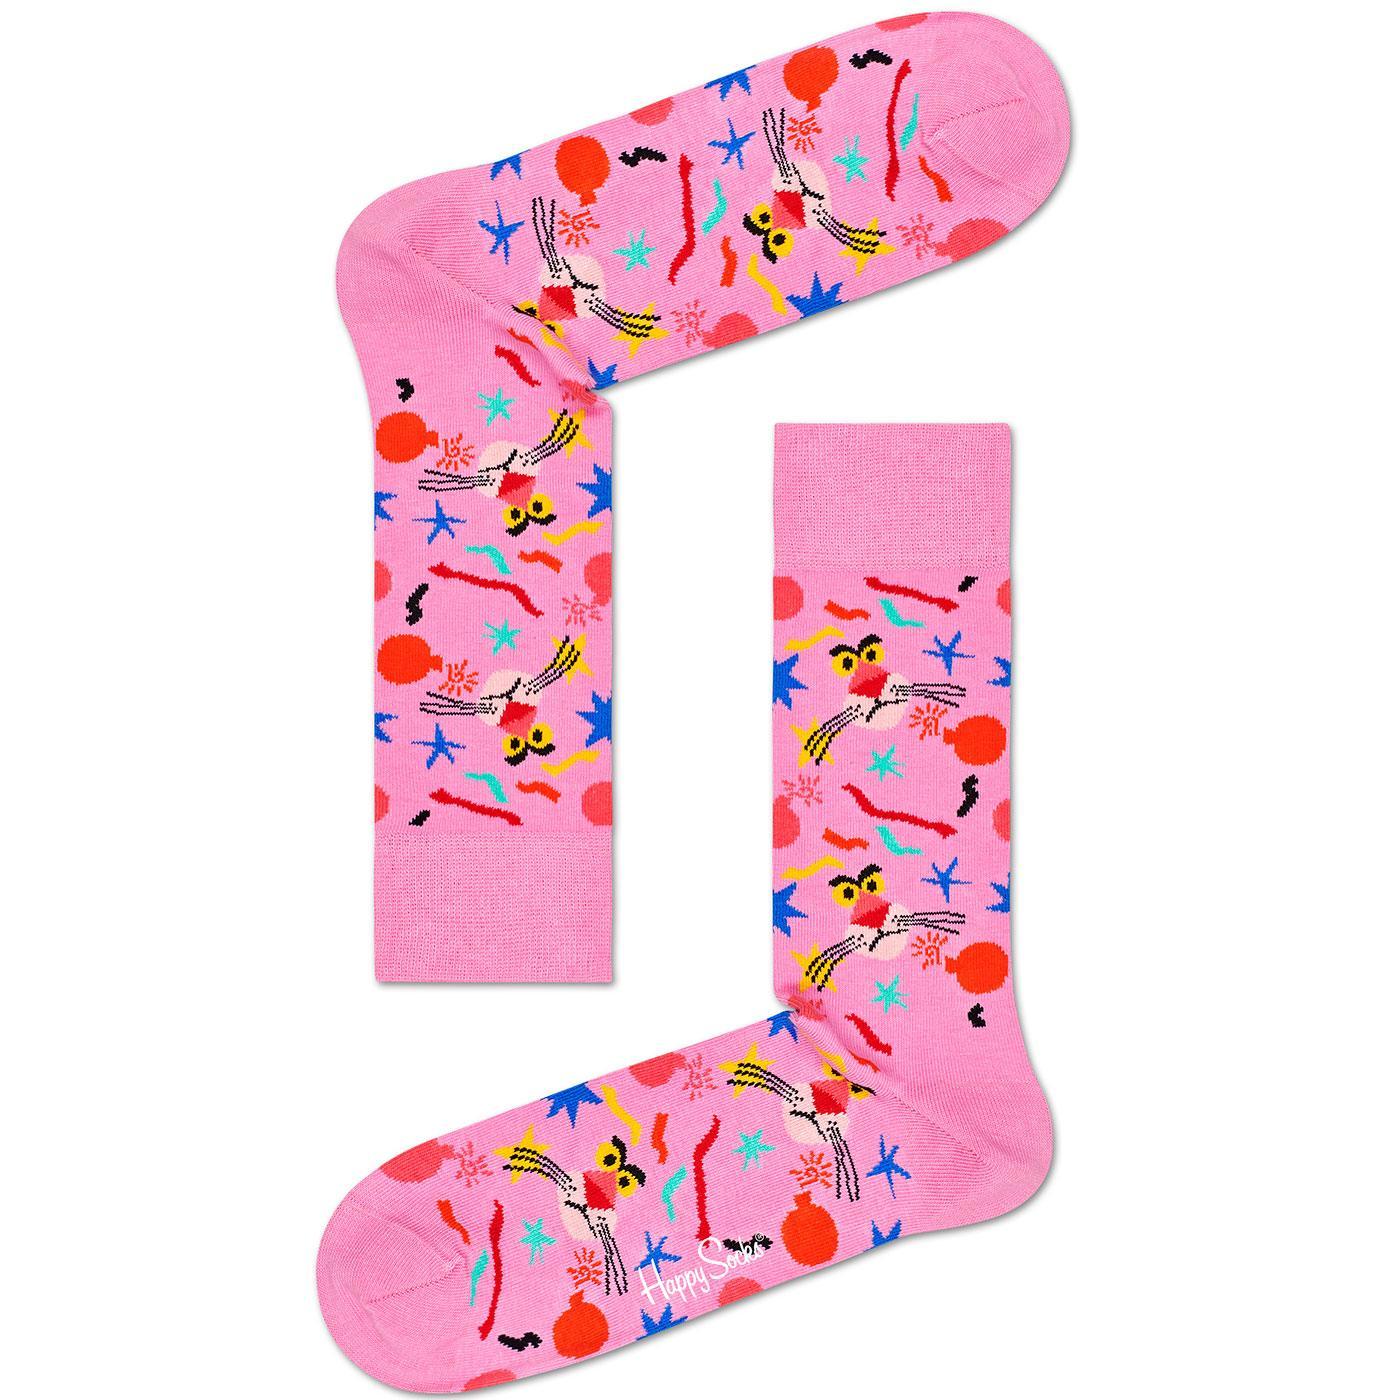 + HAPPY SOCKS x PINK PANTHER Bomb Voyage Socks